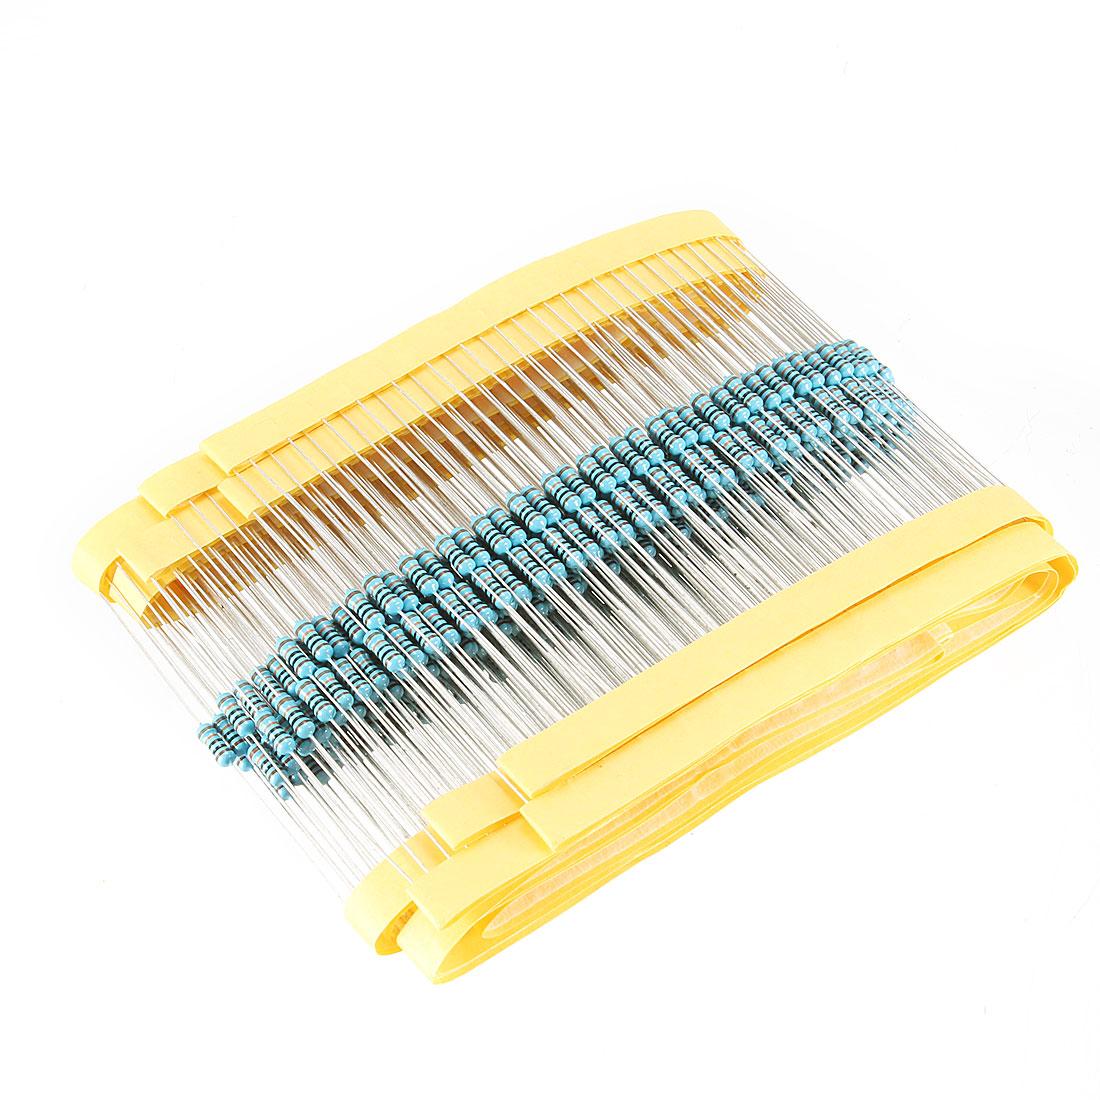 400 Pcs Axial Lead 1/4W 1% Tolerance 100K Ohm Flameproof Metal Film Resistor